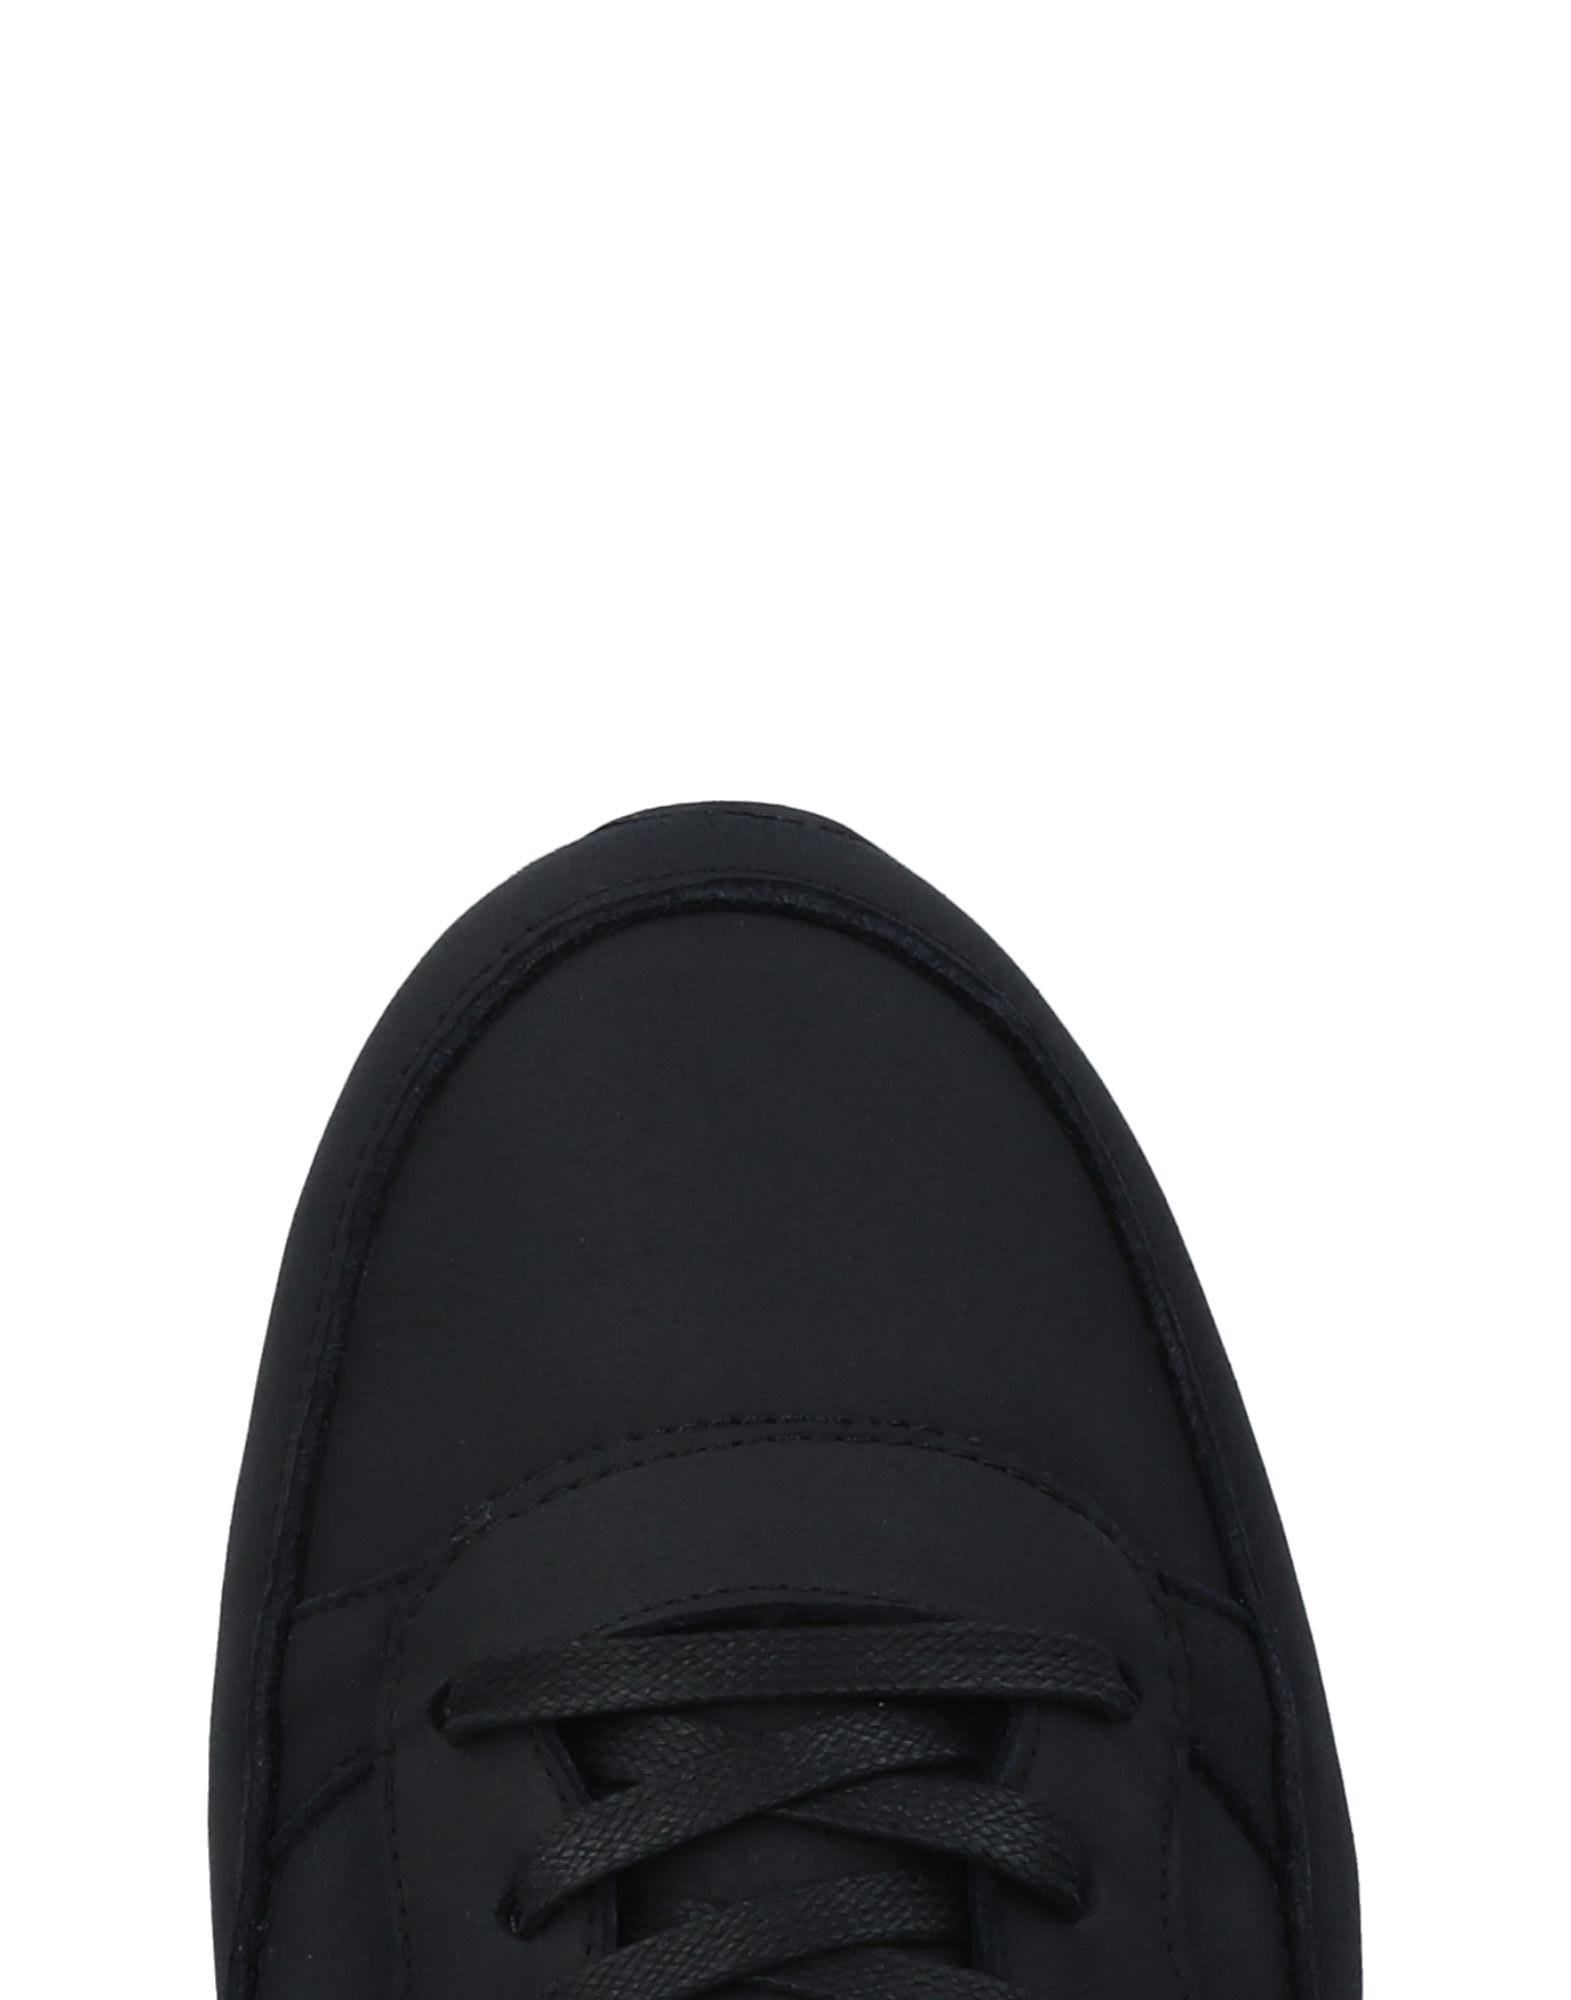 Philippe Model Sneakers Herren  11482167NS Gute Qualität beliebte Schuhe